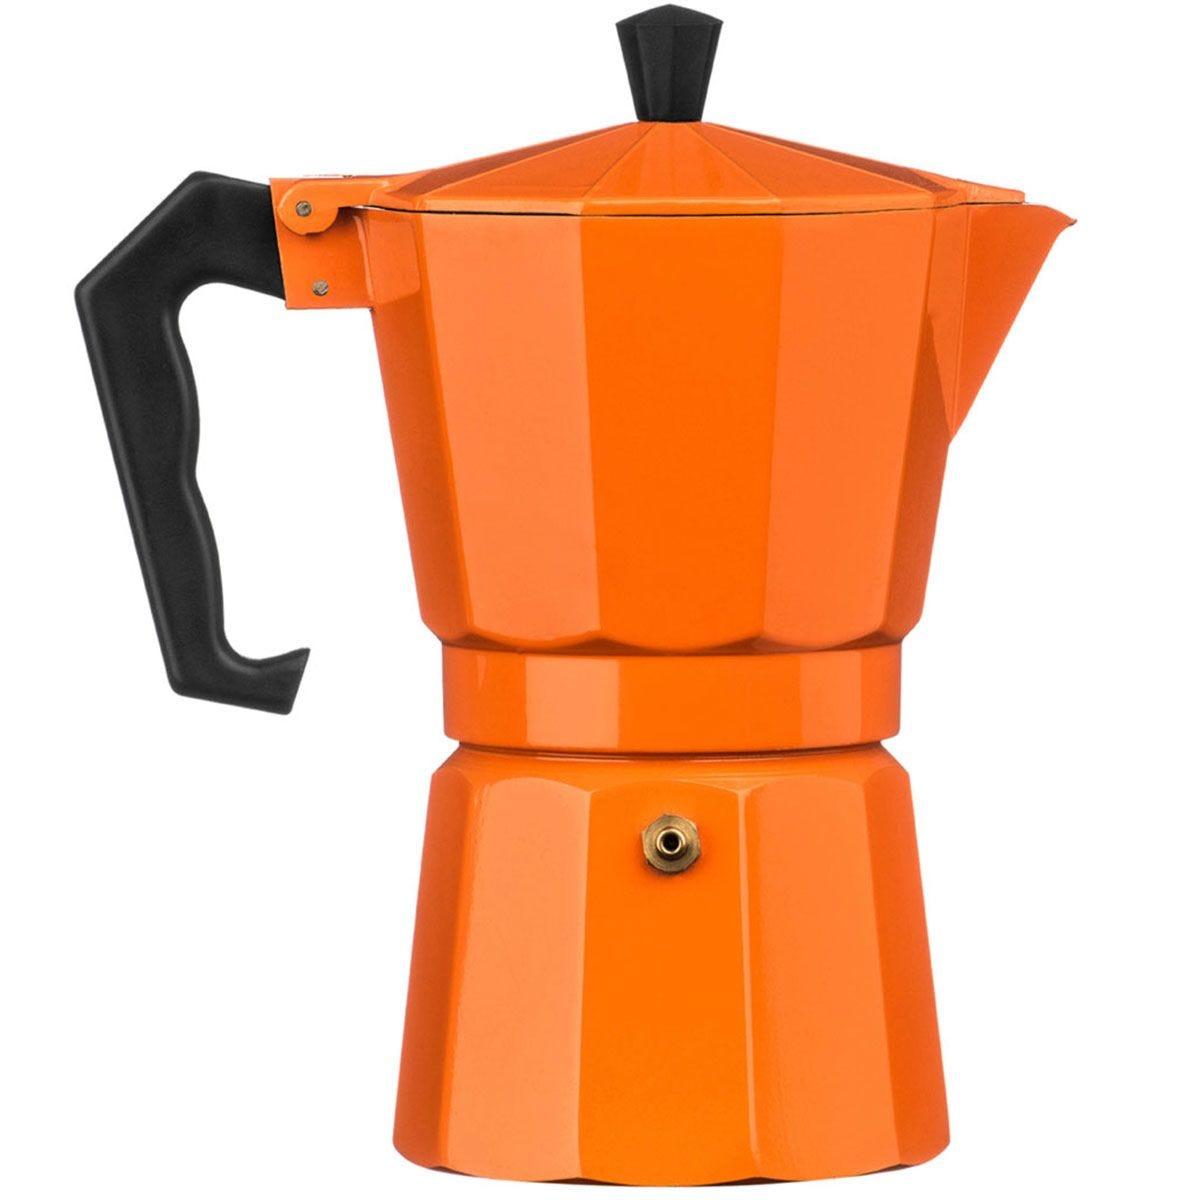 Premier Housewares 6-Cup Espresso Maker - Orange